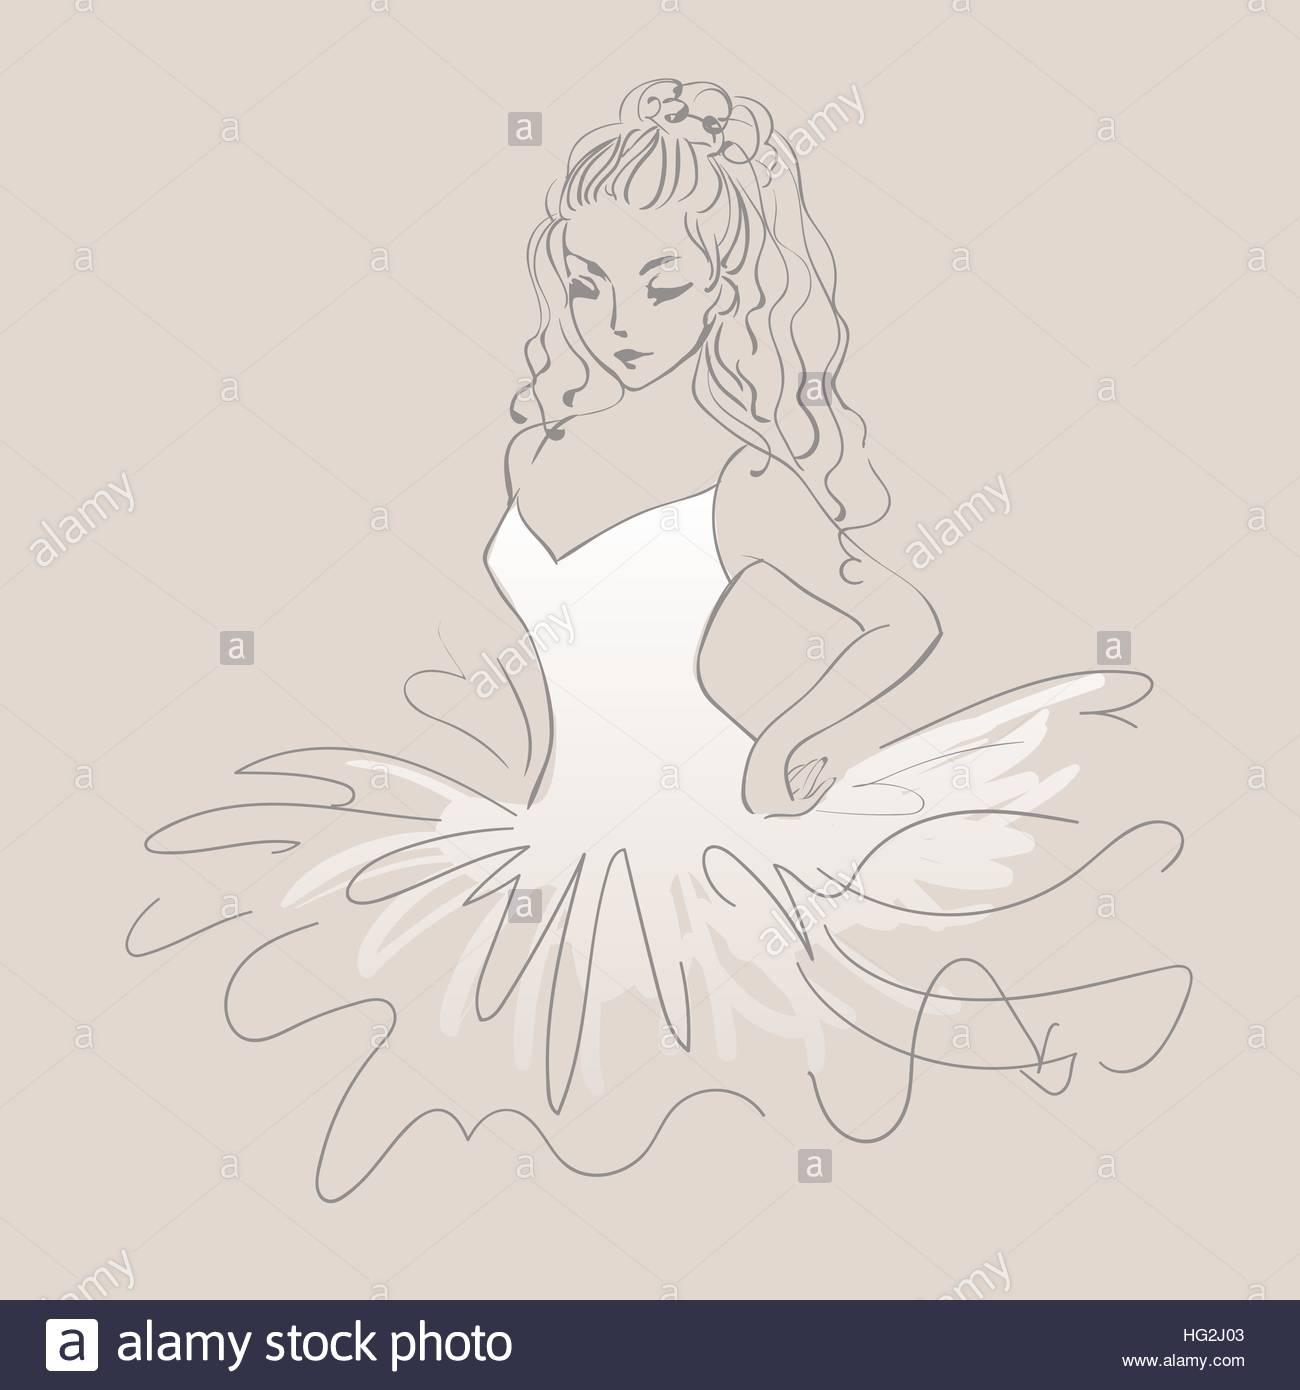 1300x1390 Sketch Of Ballerina. Expressive Performance Girl Ballet Drawing